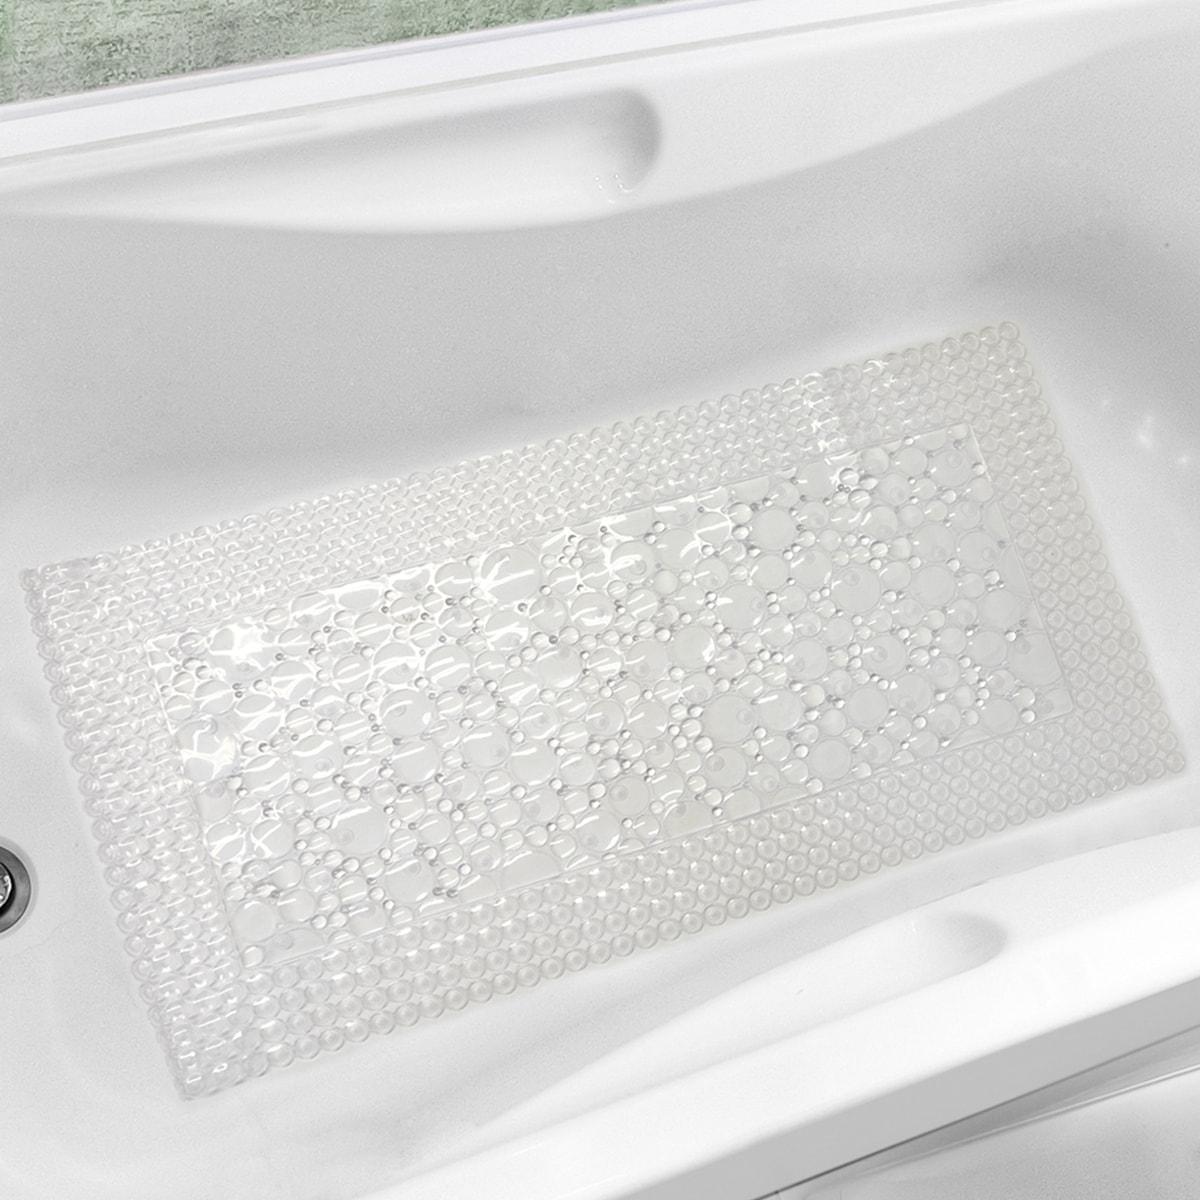 Shop Bubbles-N-Circles White or Clear Trim-Fit Tub Mat (20\